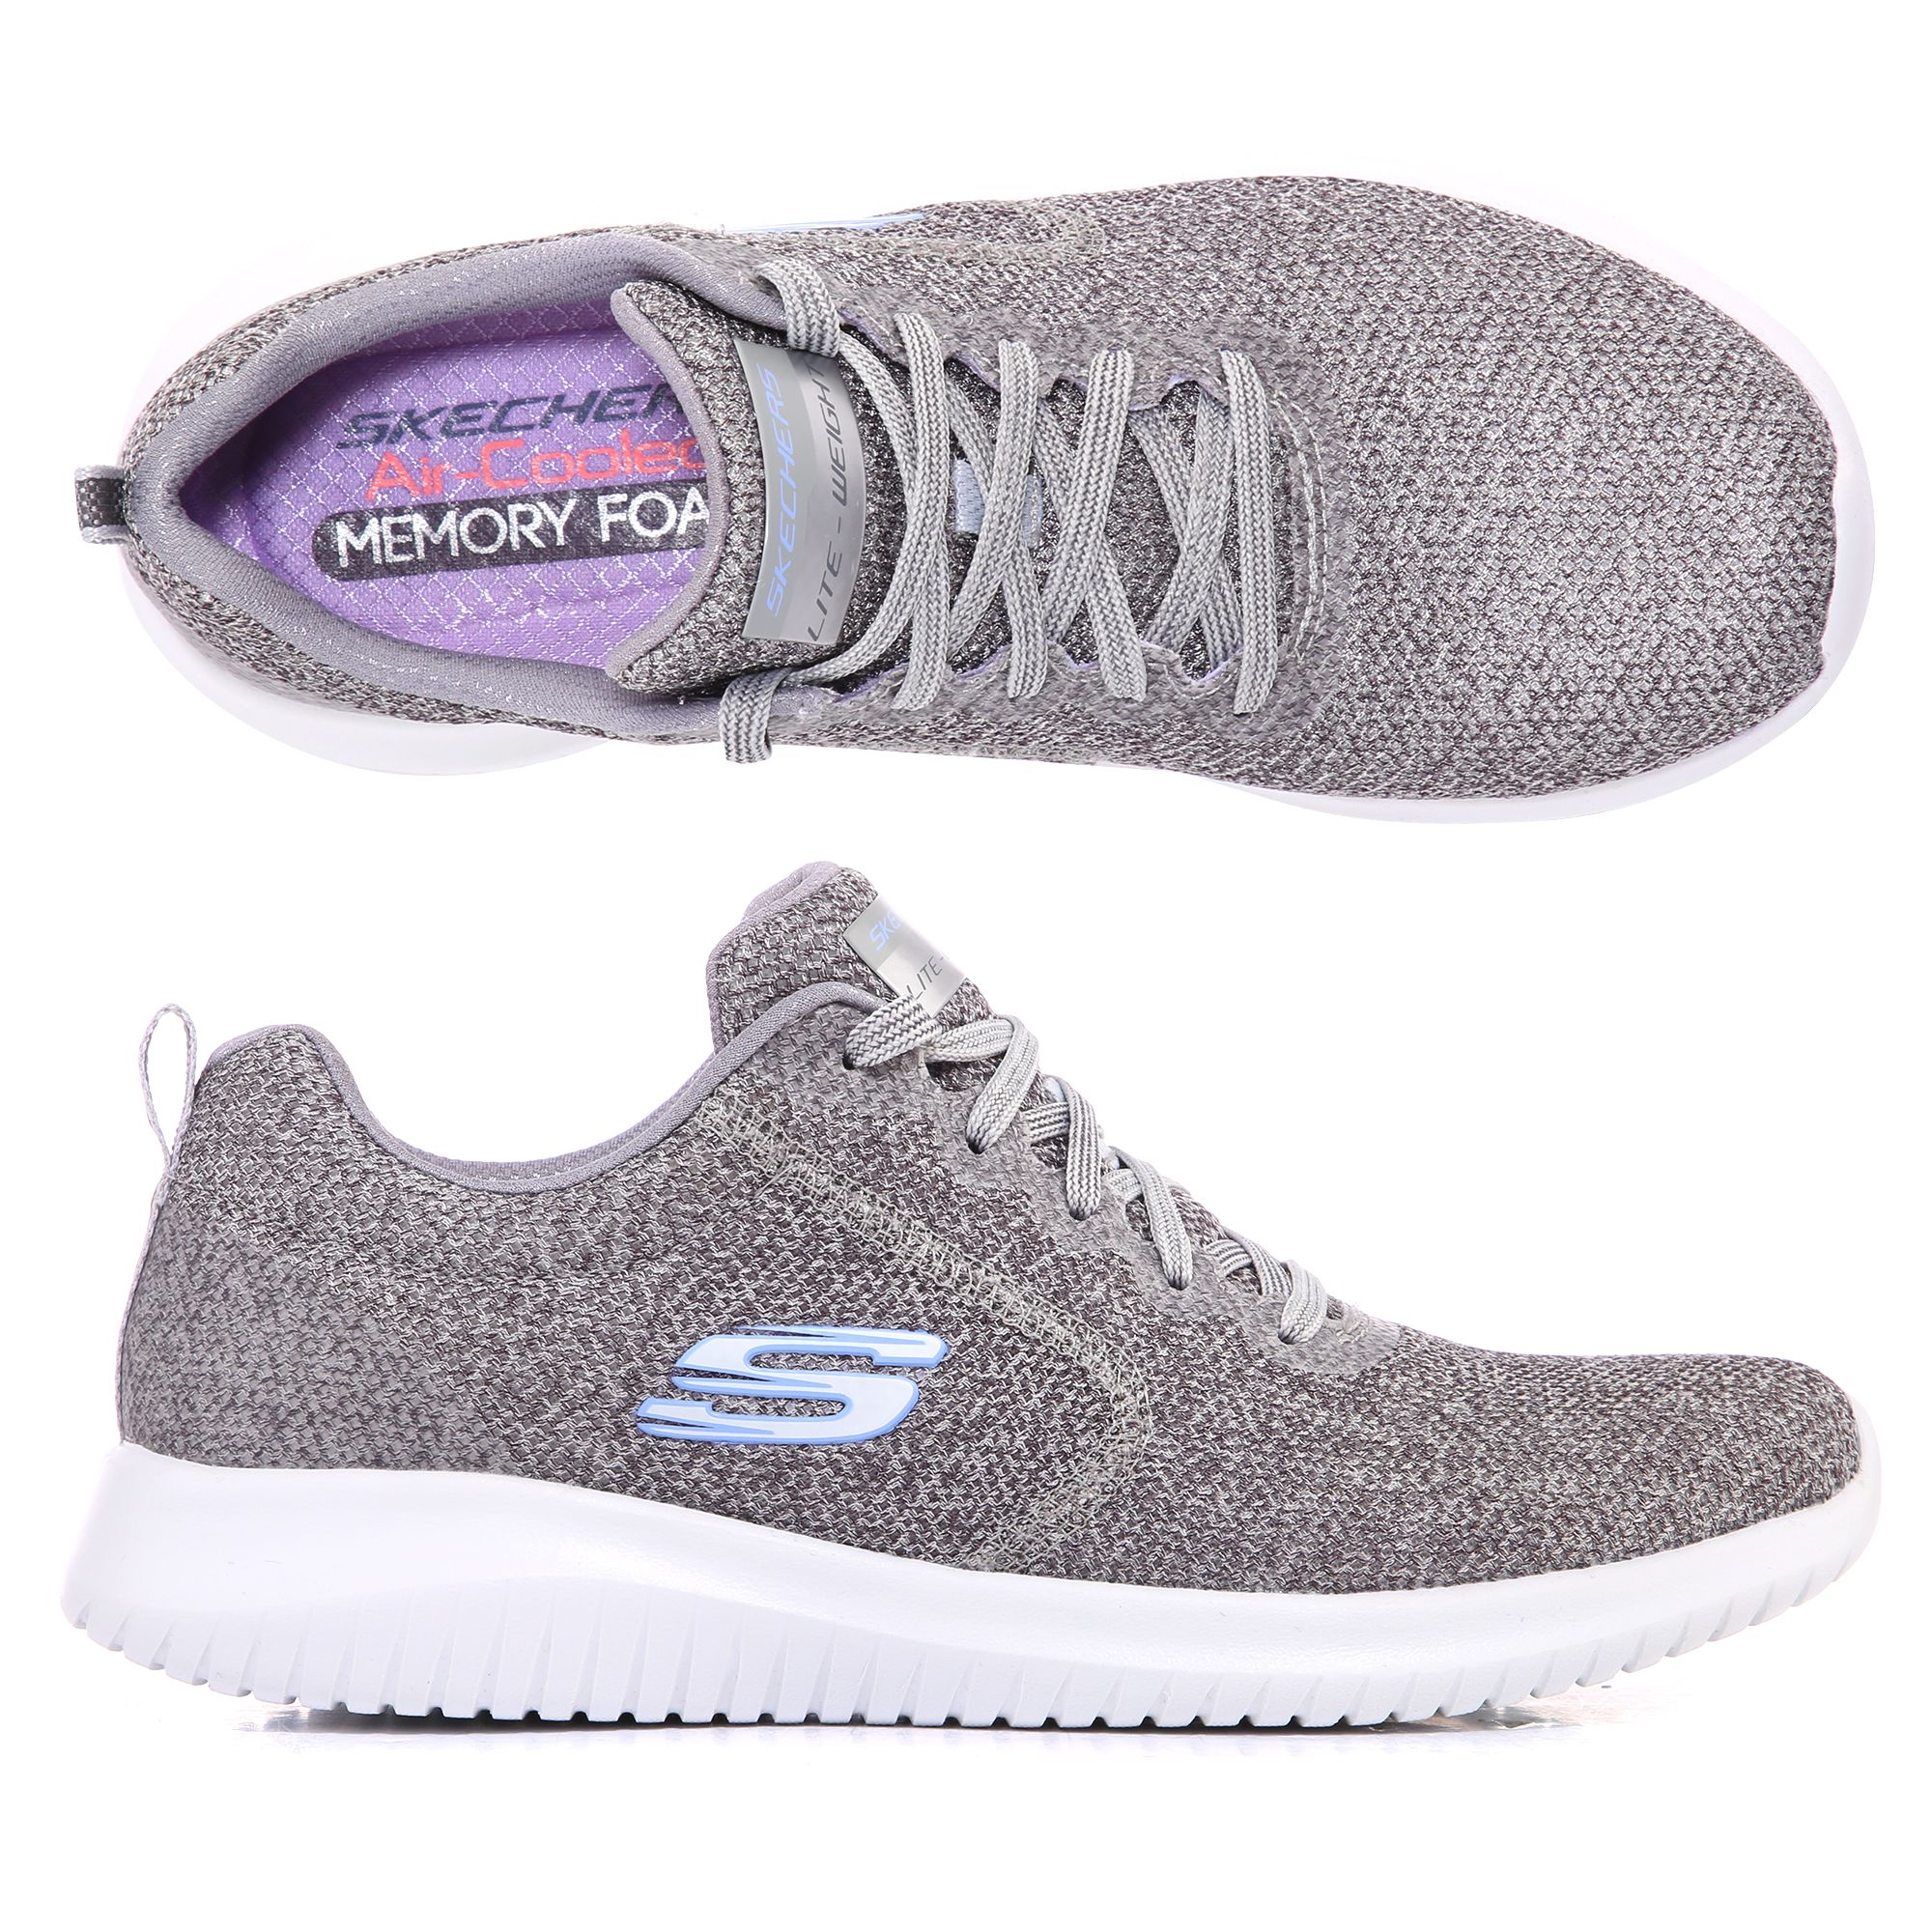 948d87485e SKECHERS Damen-Sneaker Ultra Flex Textil & Mesh Memory Foam - Page 1 —  QVC.de